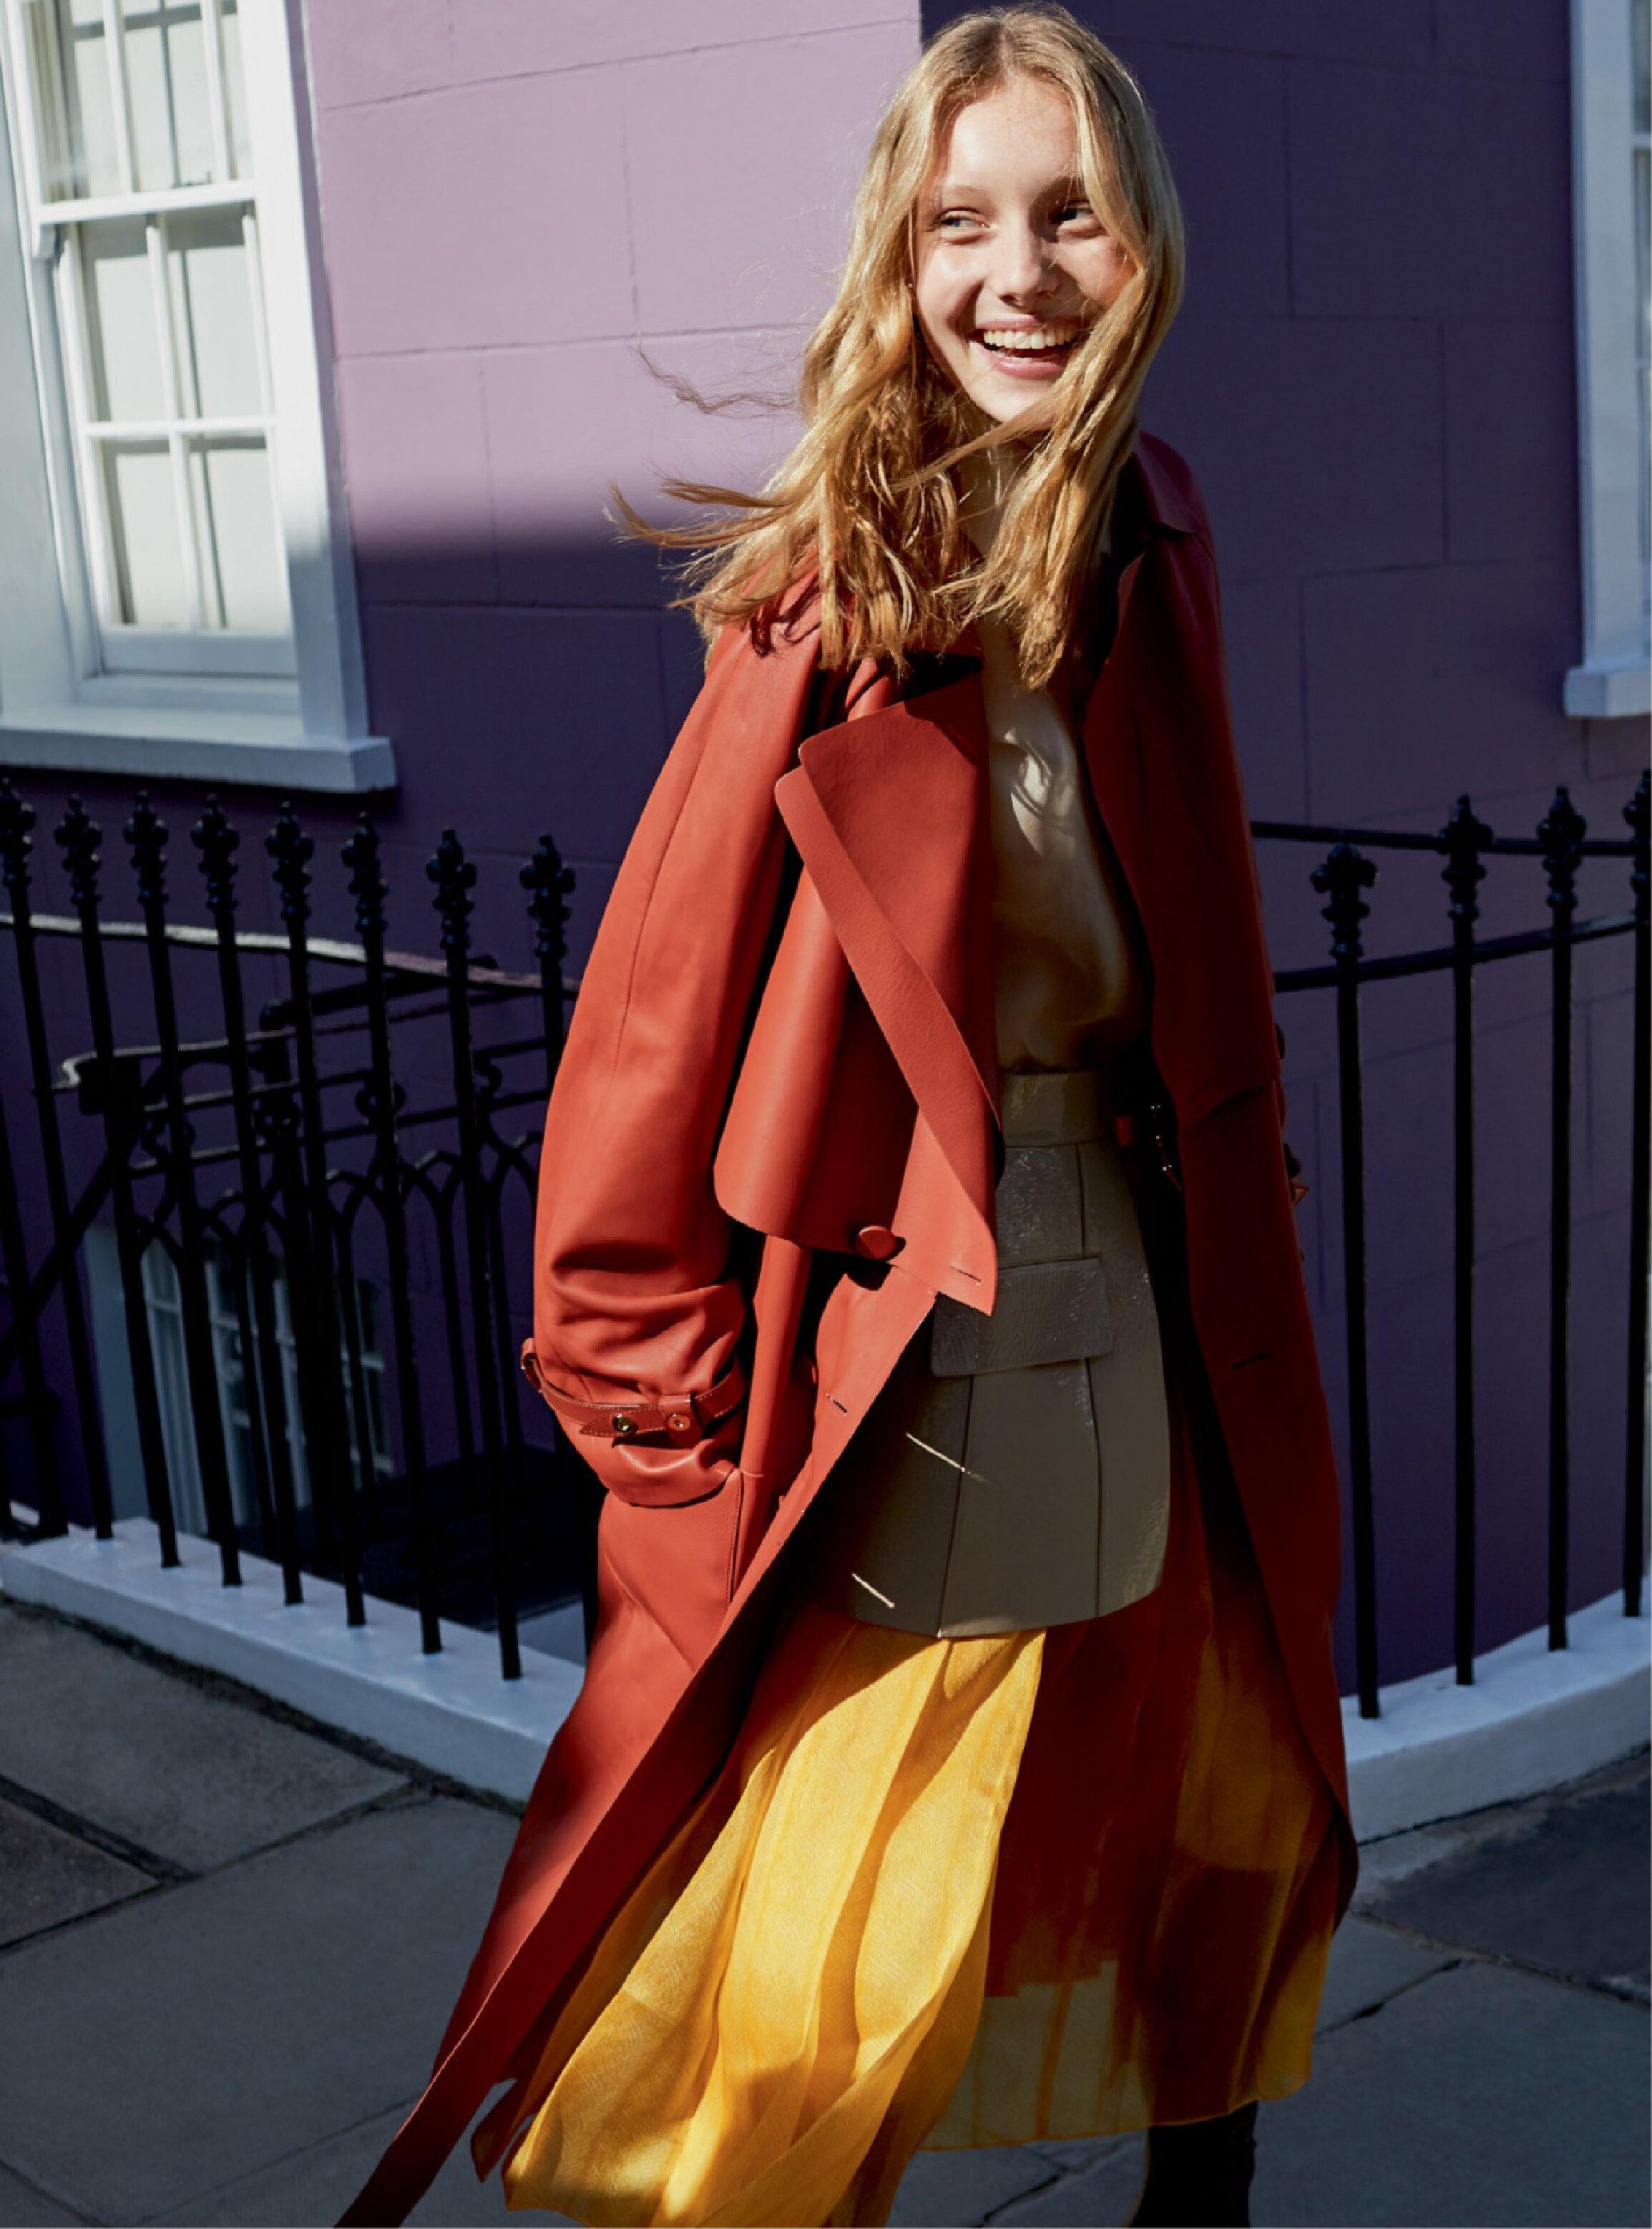 Agata Popieszynska-Girls Are Back in Town Harper's Bazaar UK Aug 2019 (7).jpg